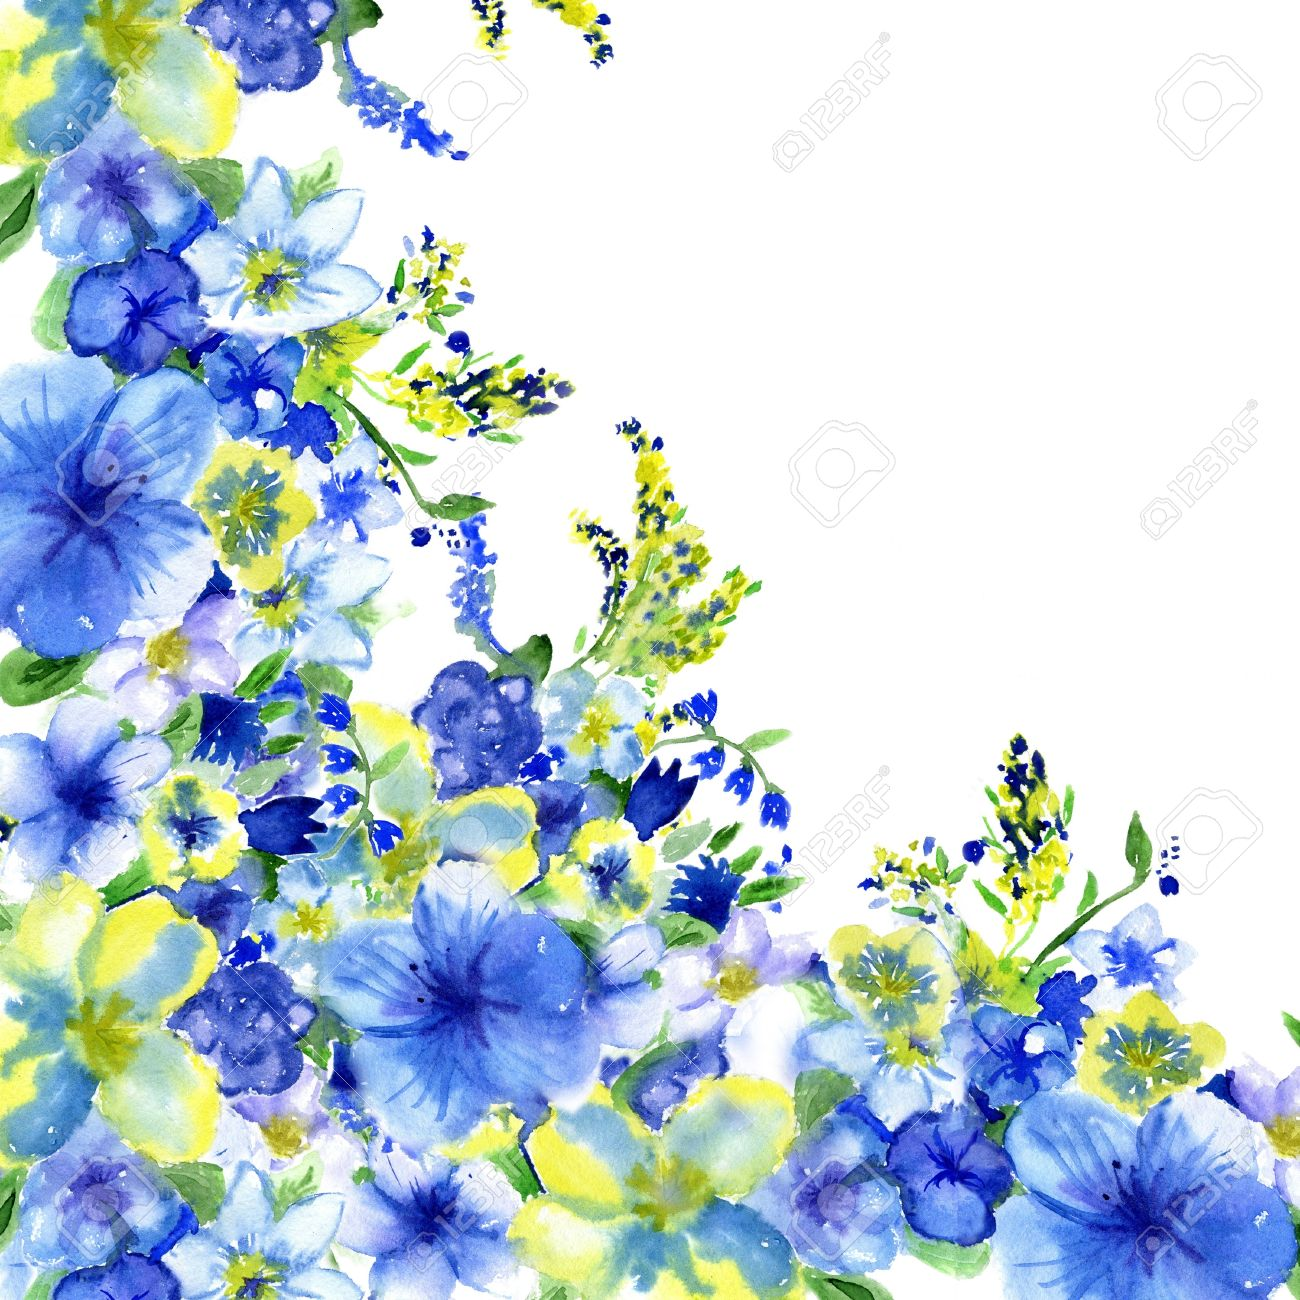 watercolor dark blue and